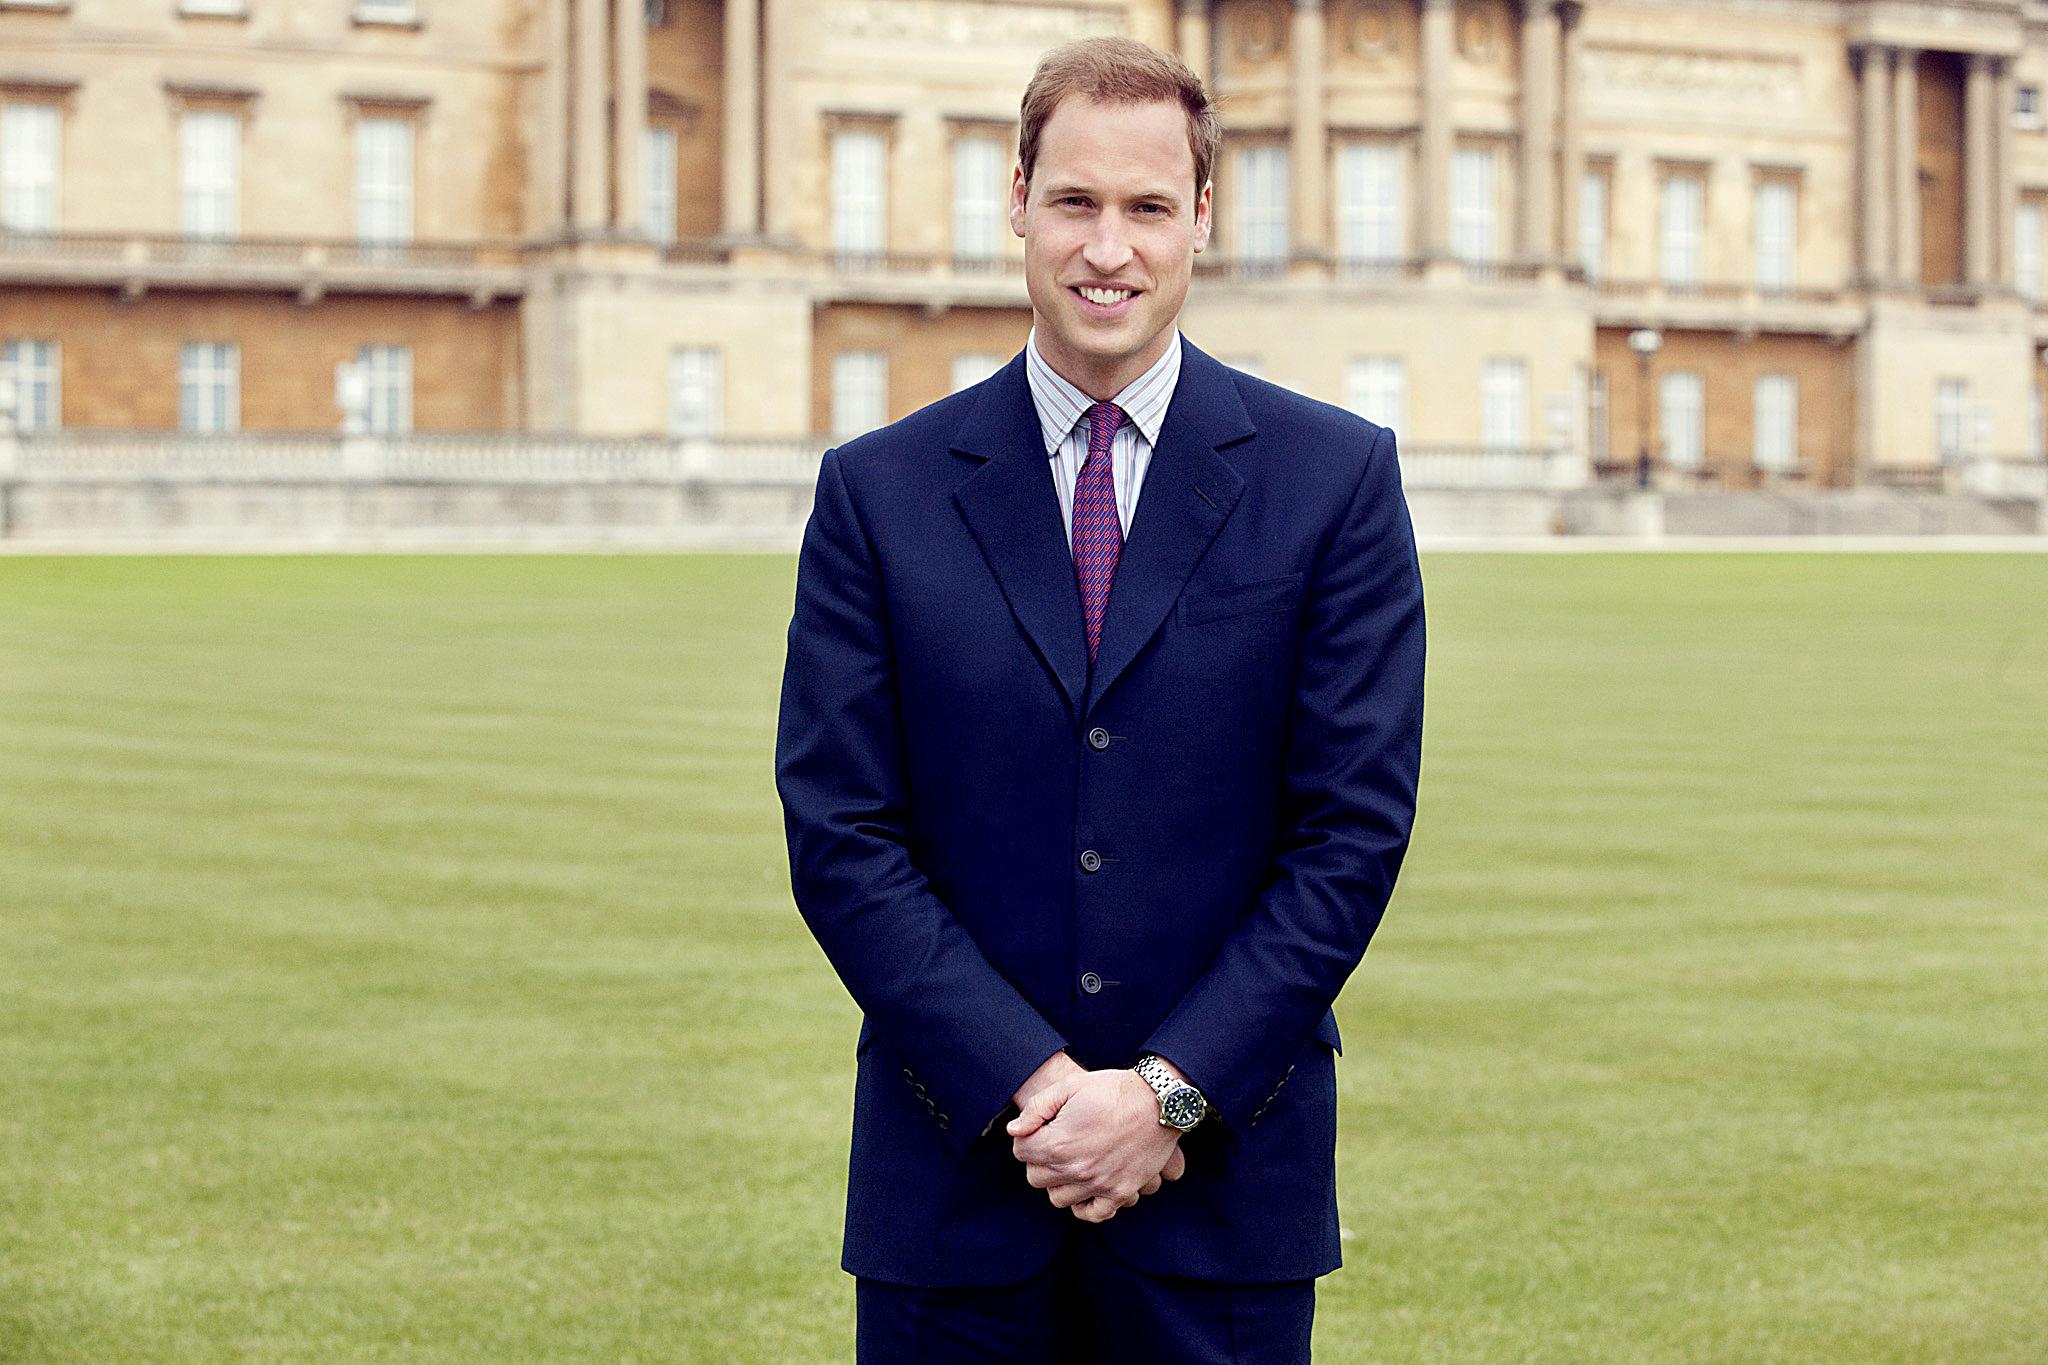 Prince William Duke of Cambridge-Fields in Trust